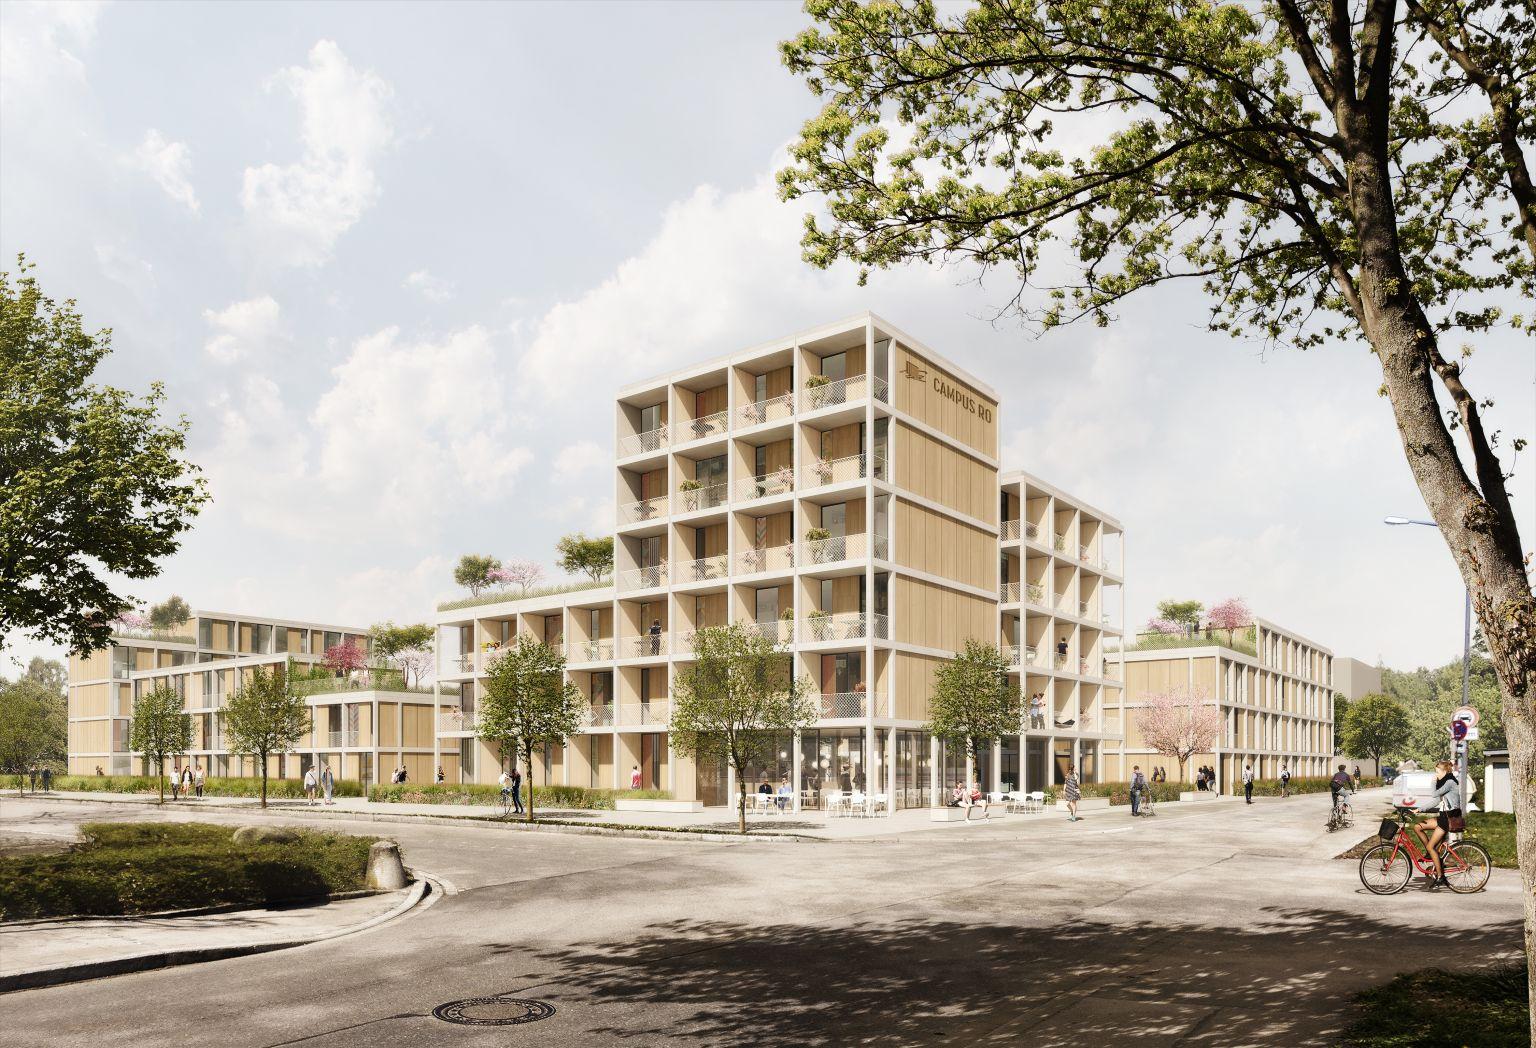 Holzhybrid-Studenten-Quartier mit DGNB-Platin-Zertifikat